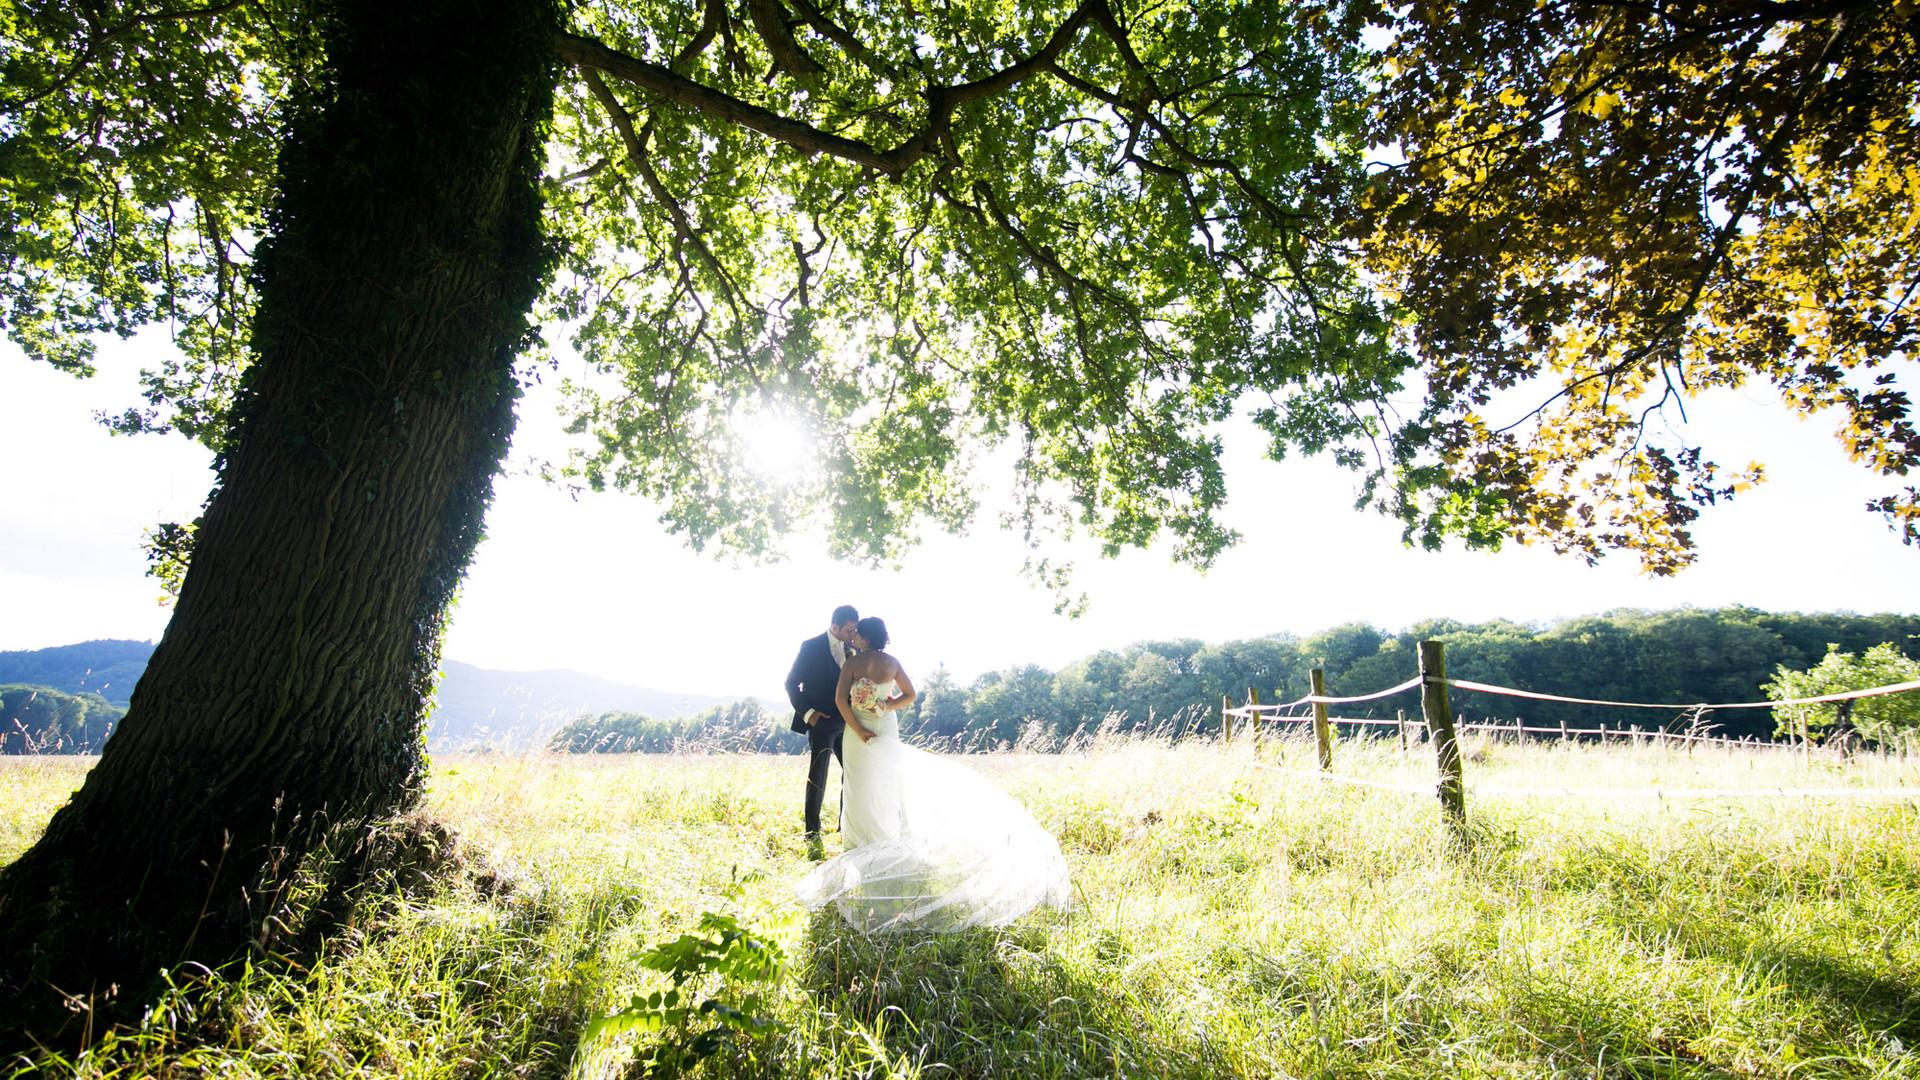 19_Hochzeitsfotograf_Pfalz_Mannheim_Heid